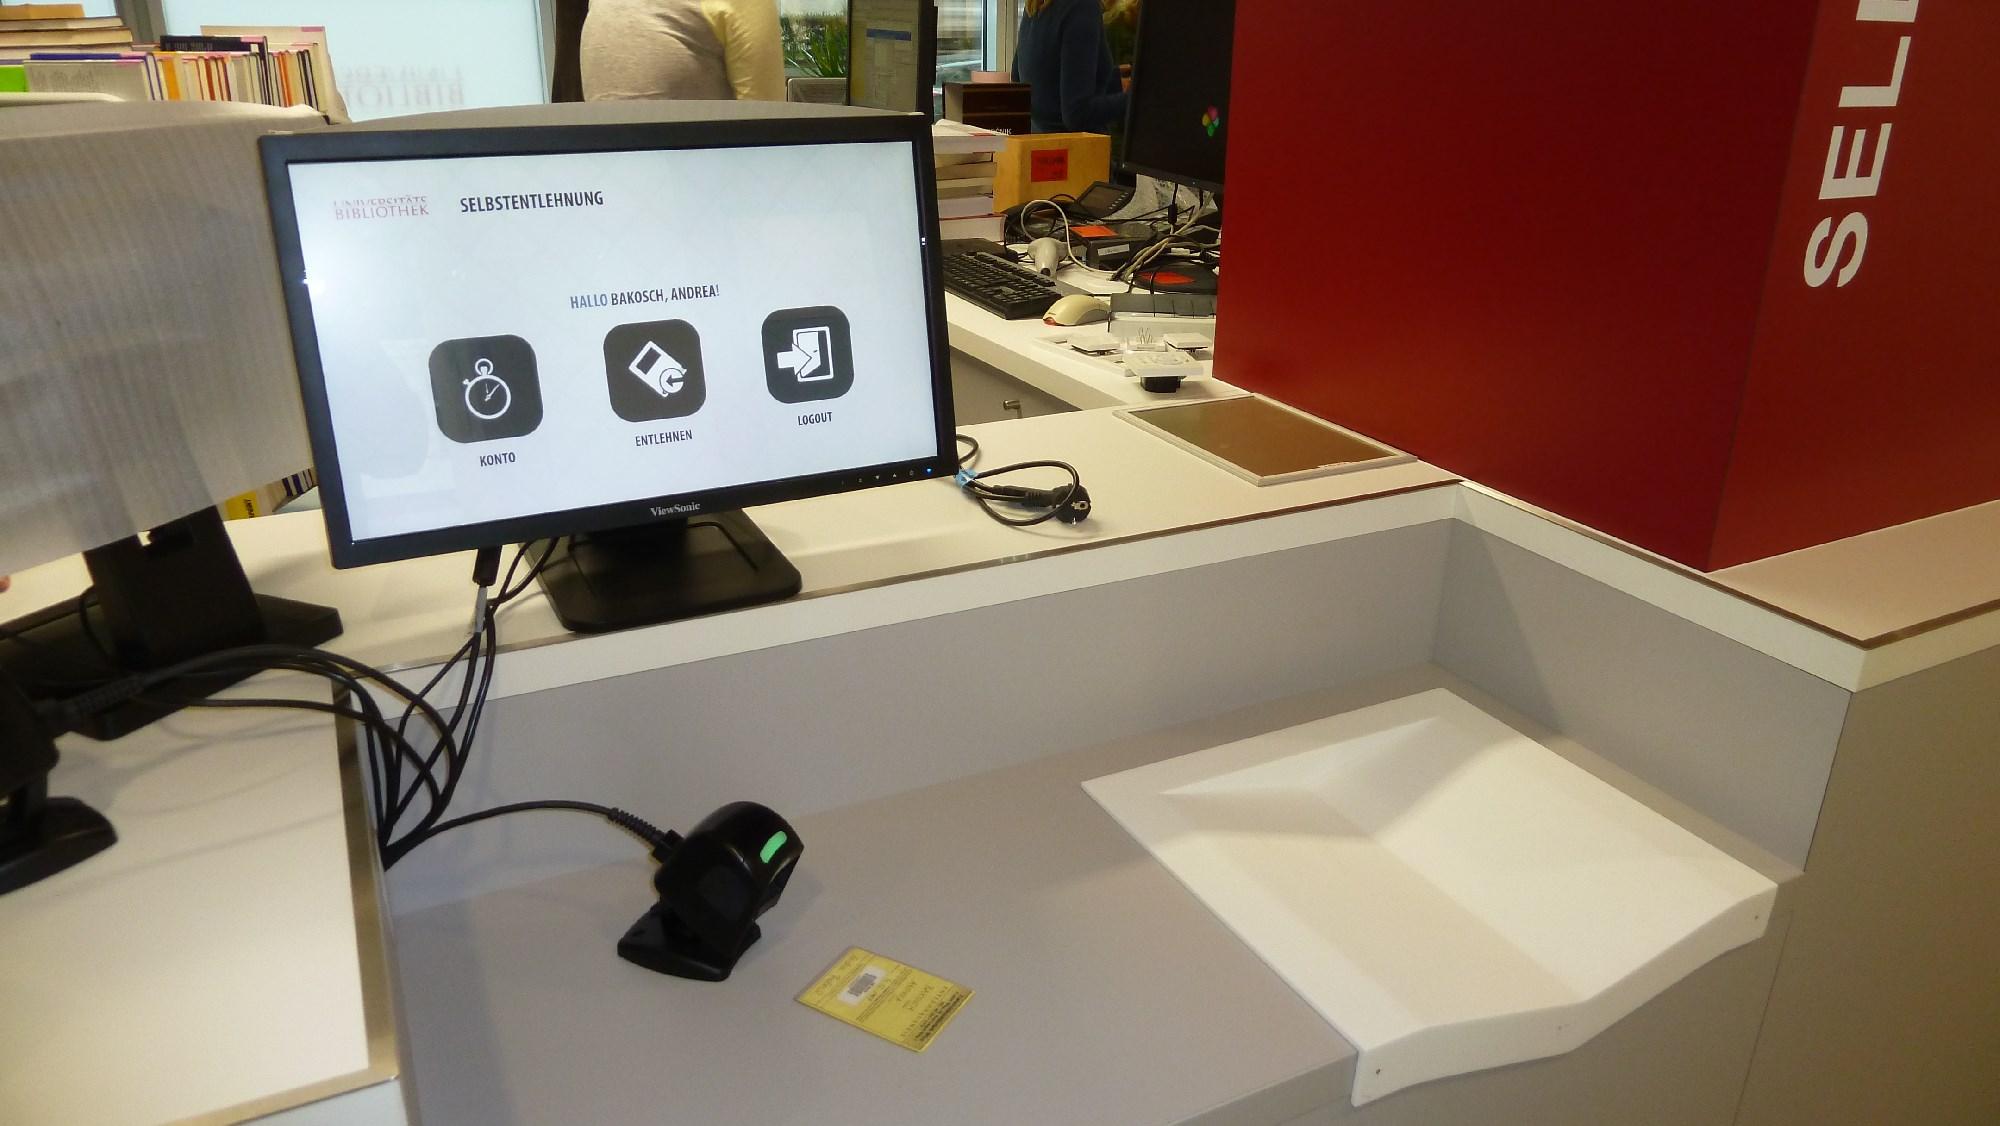 RFID Sebstverbucher